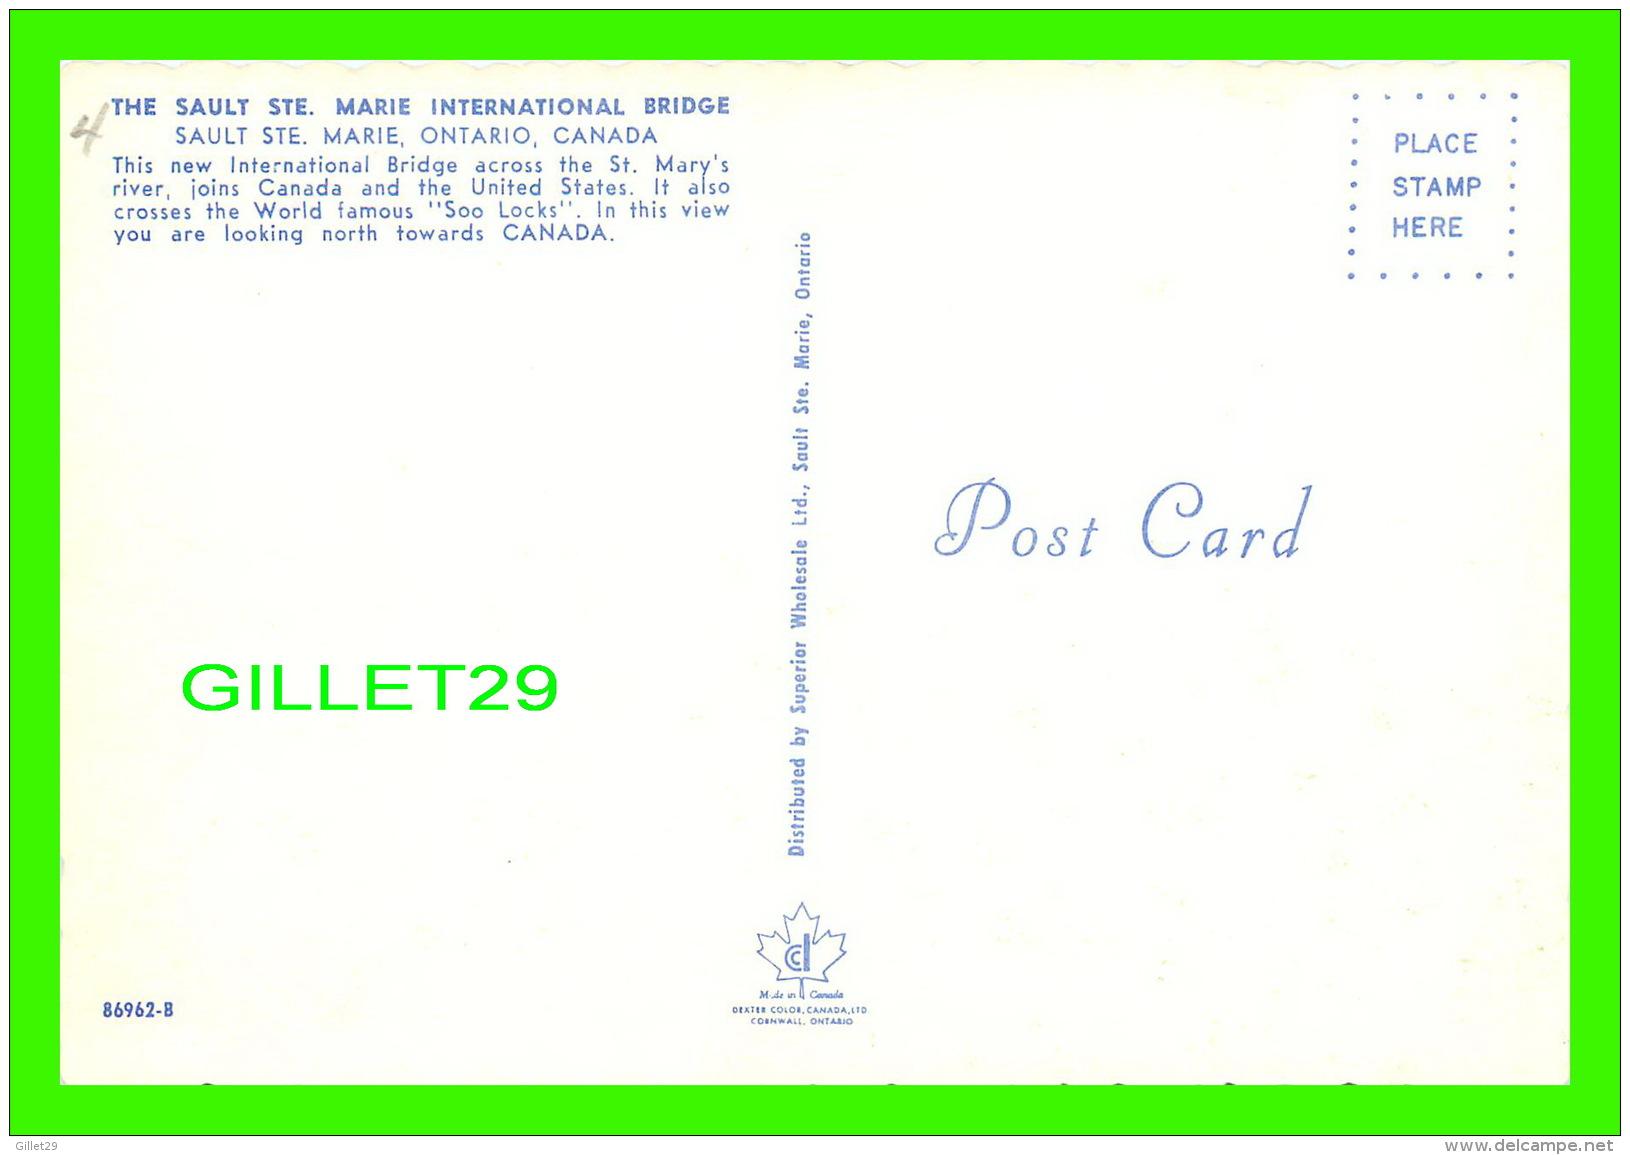 SAULT STE MARIE, ONTARIO - THE SAULT STE MARIE INTERNATIONAL BRIDGE - SUPERIOR SOUVENIR WHOLESALE LTD - - Ontario